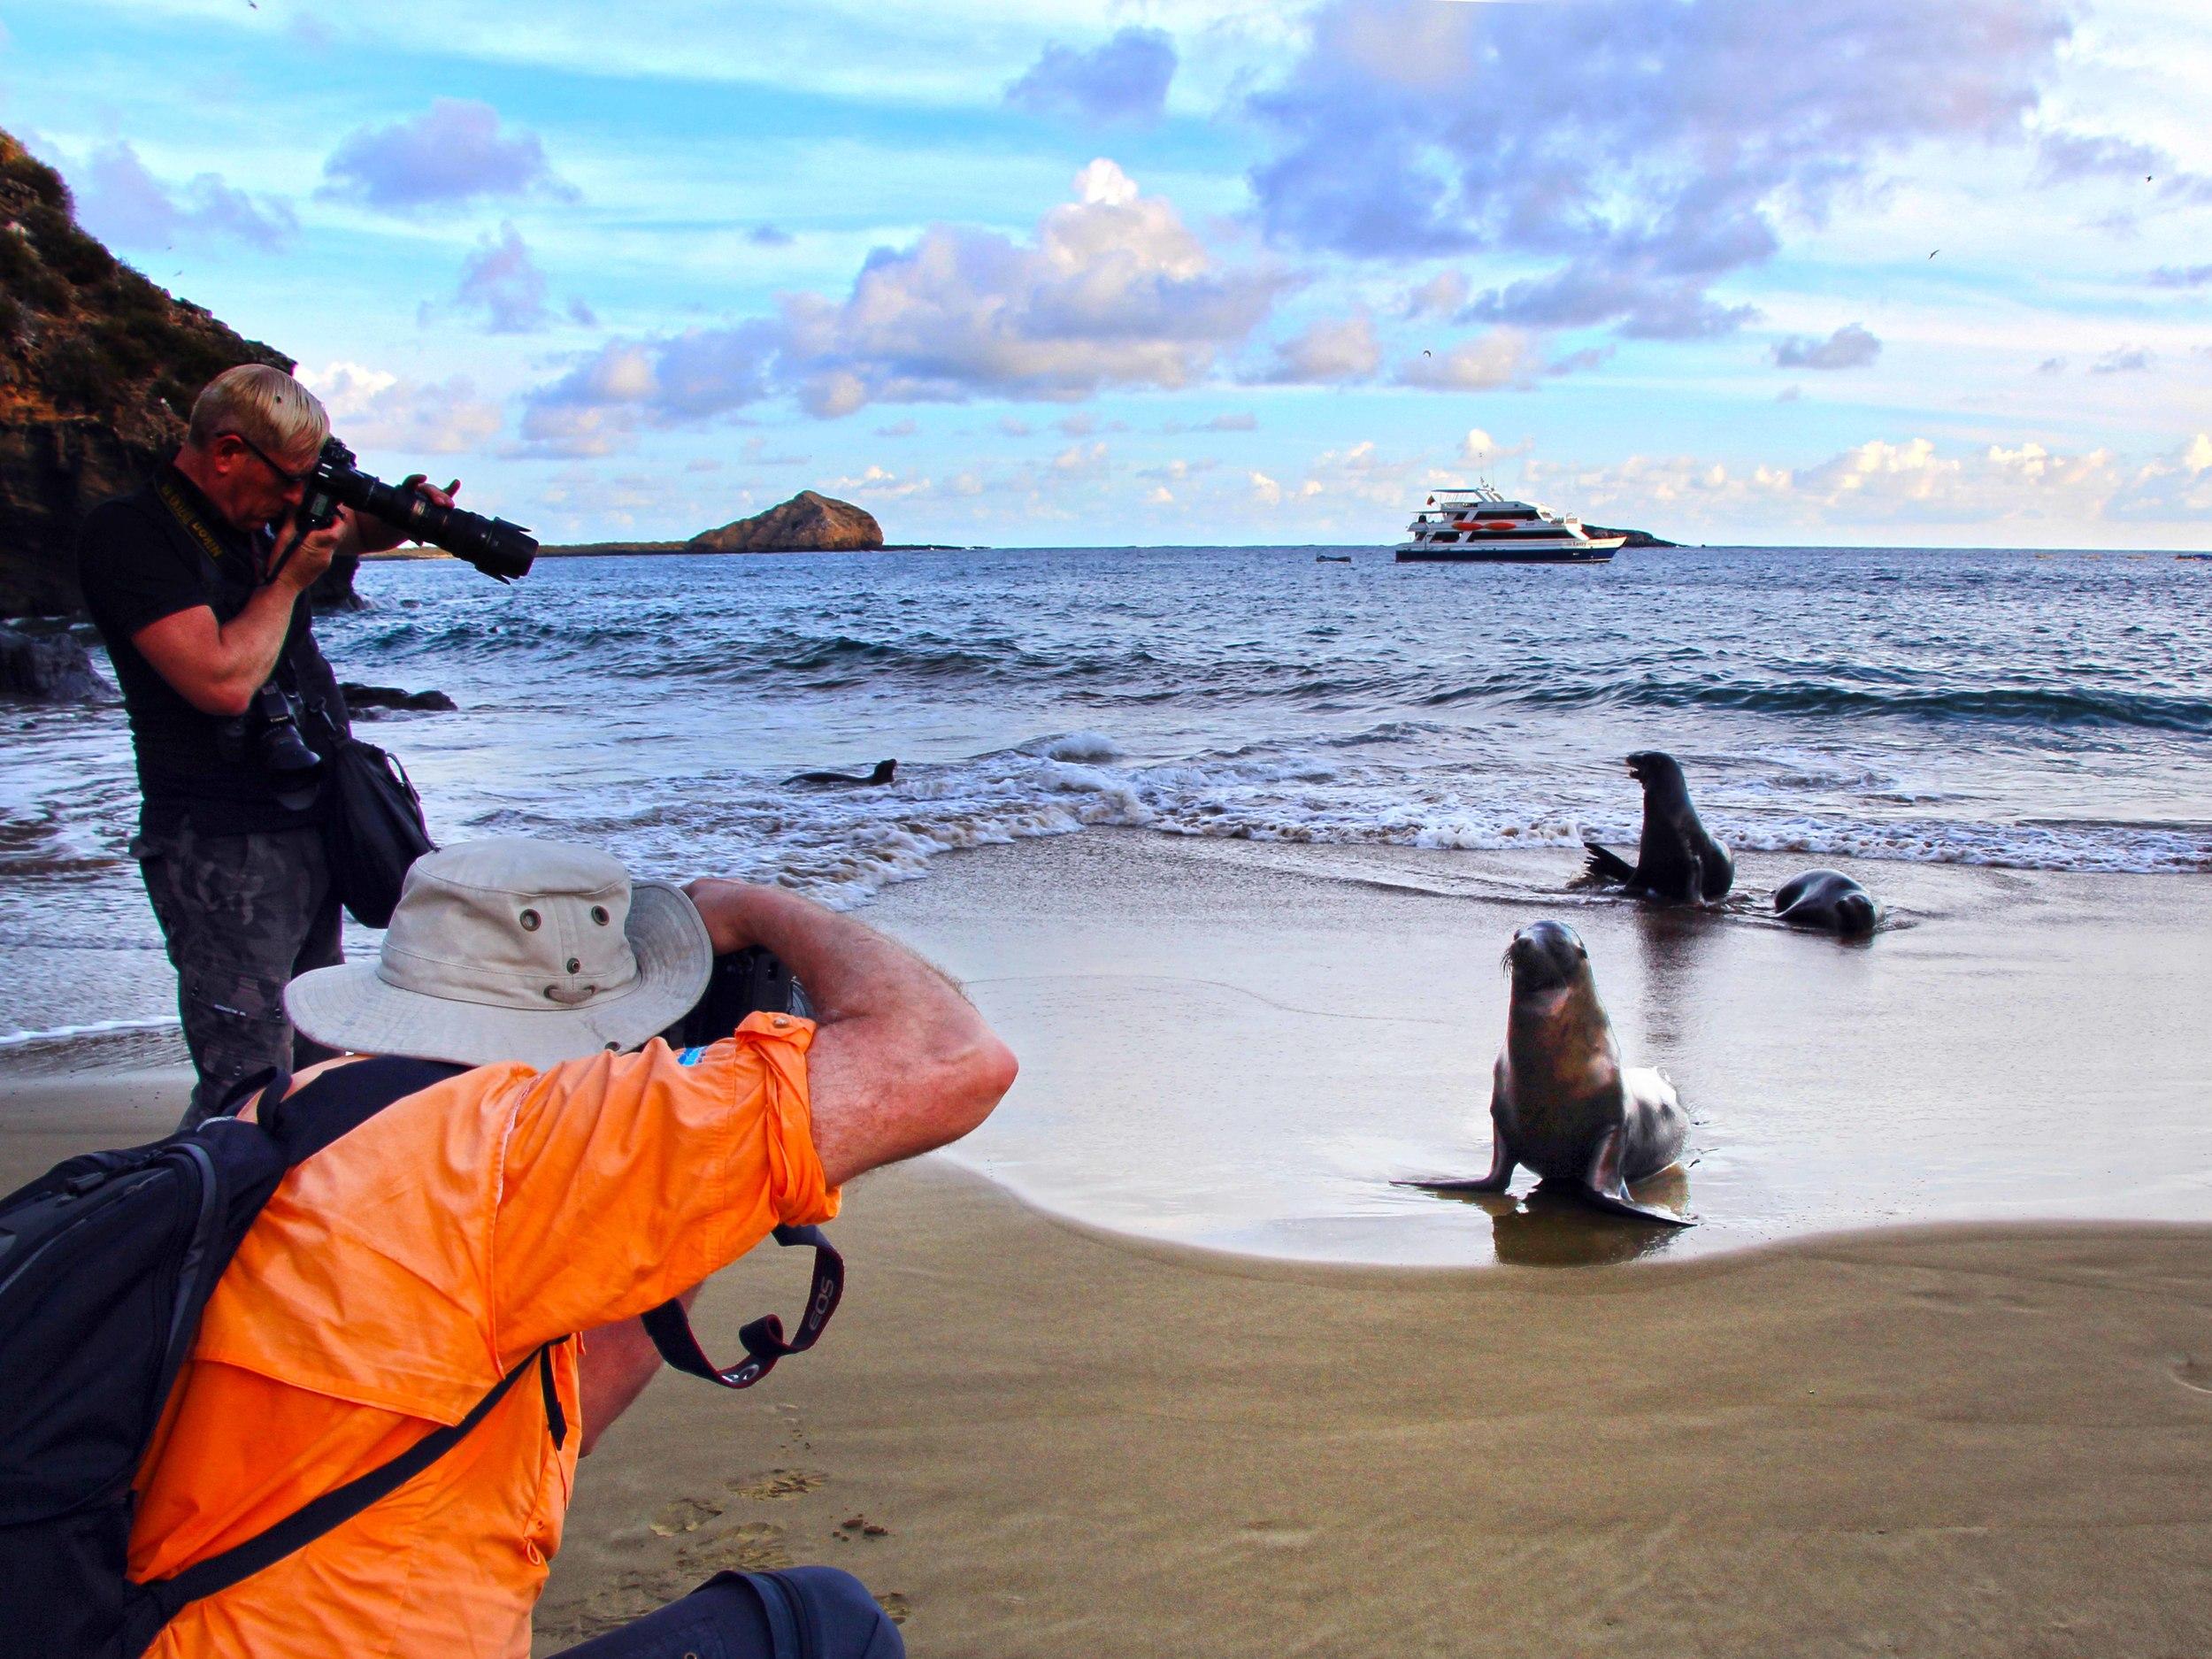 Photographers Getting Their Best Shot, Galapagos Islands      ©Joanne DiBona